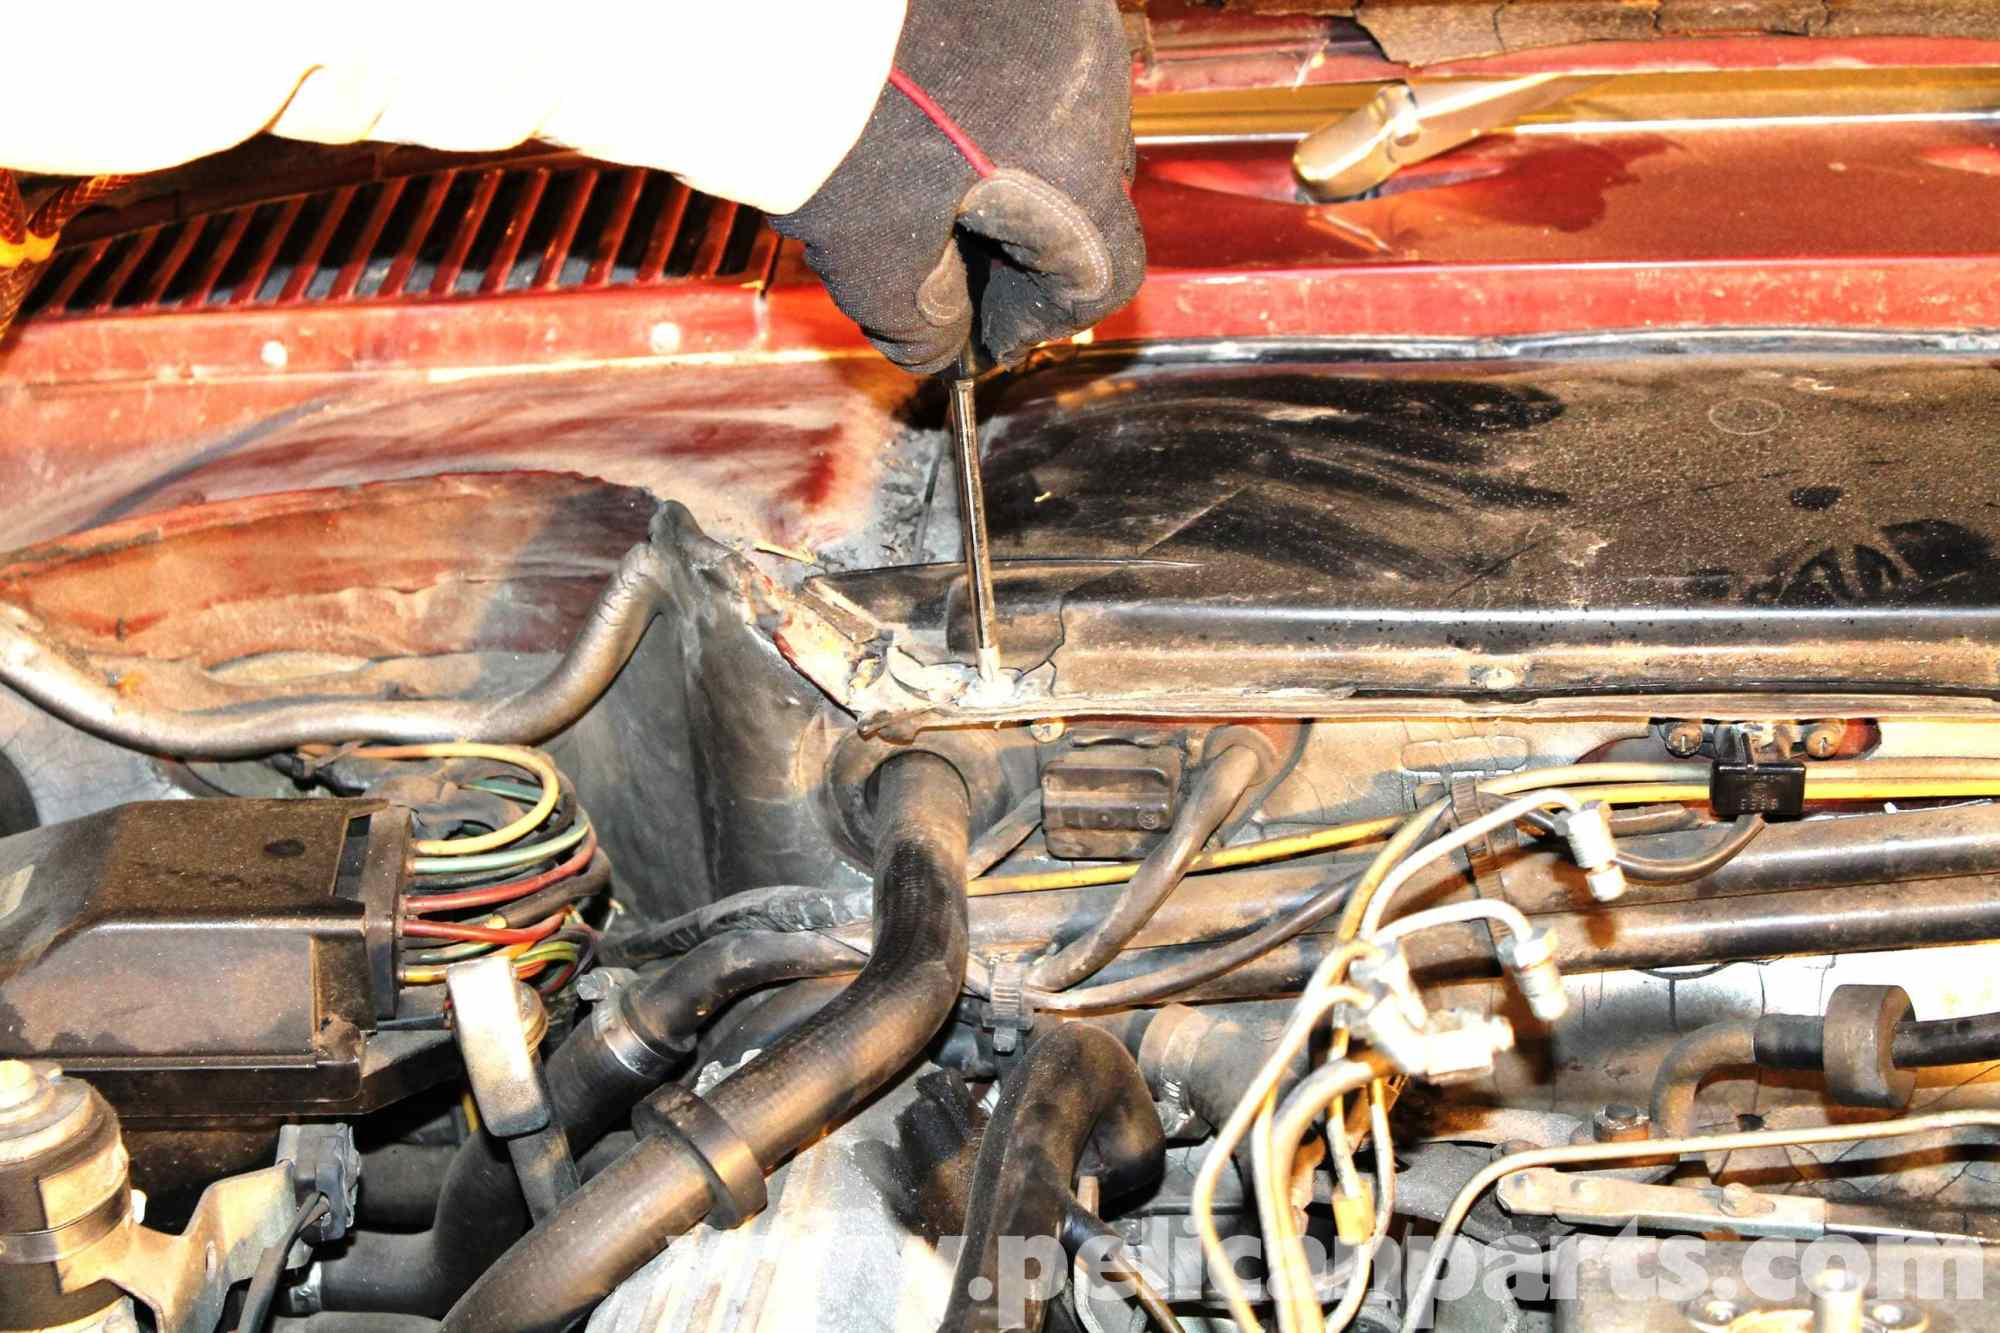 hight resolution of mercedes benz r107 heater blower motor replacement 1972 1986 ac transformer diagram 1973 450sl heater ac diagram